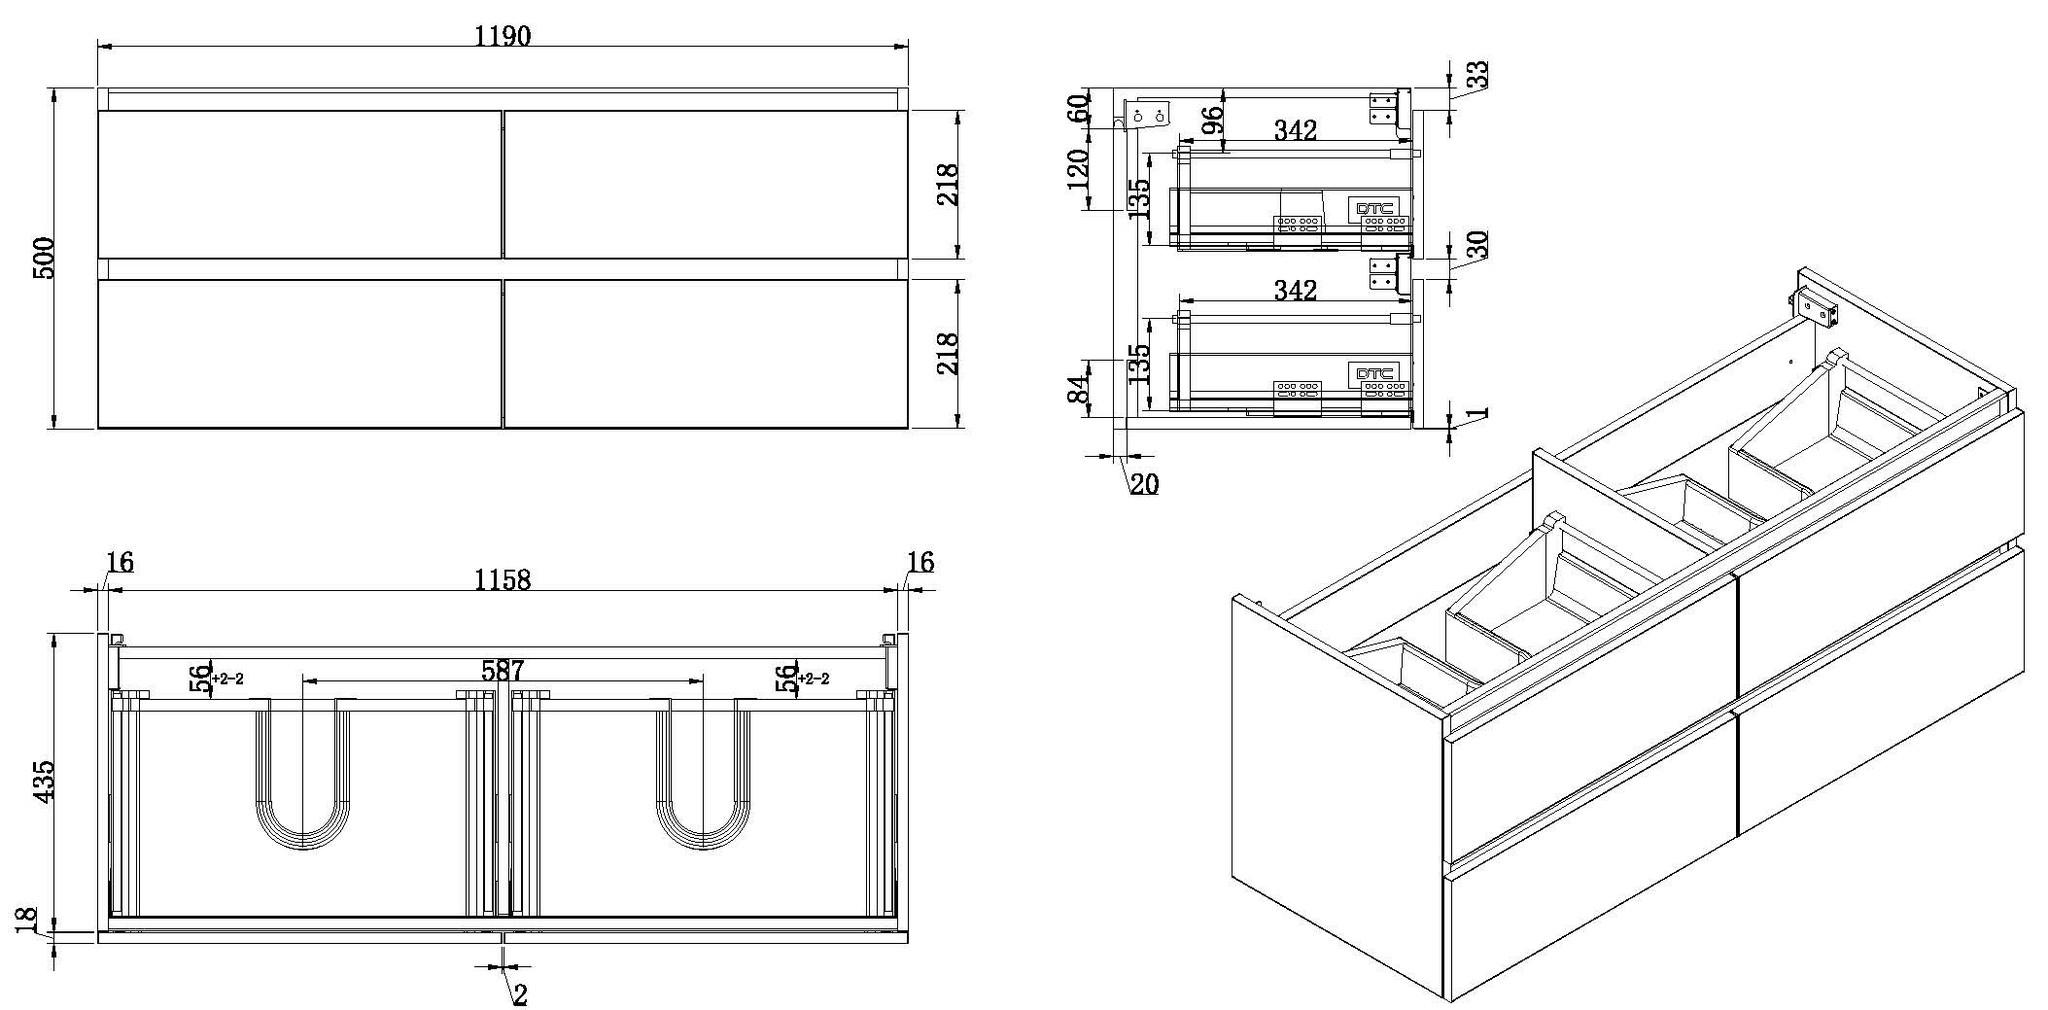 Wiesbaden Vision onderkast dubbel+4 laden 120x46 hoogglans grijs